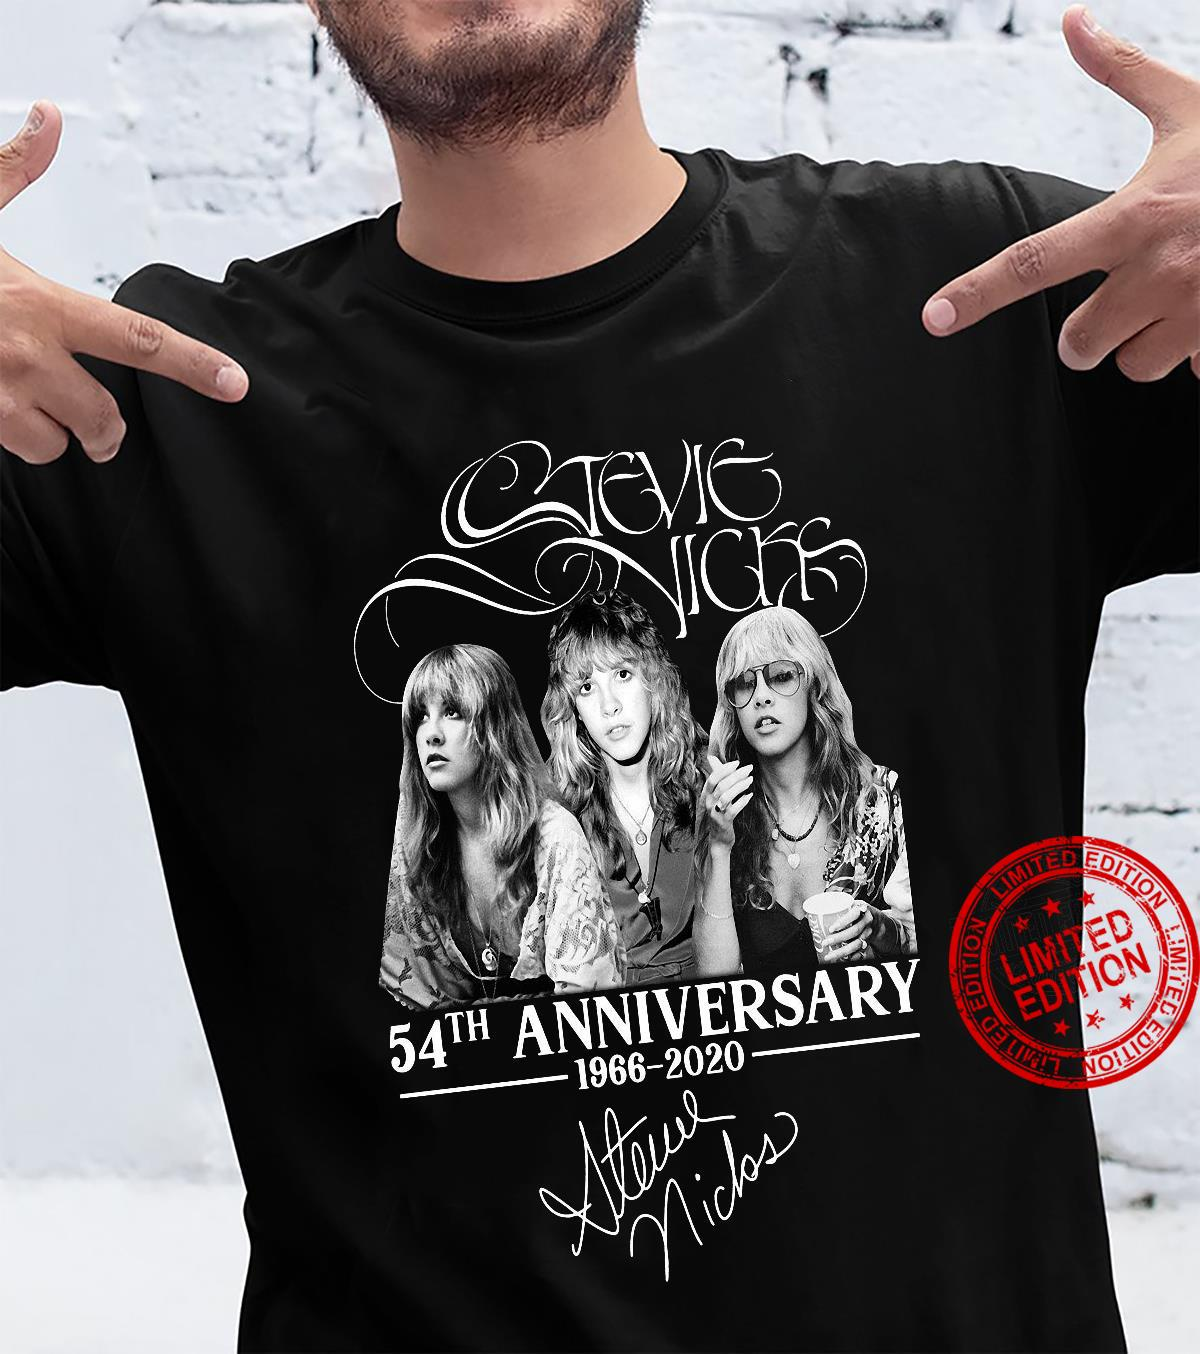 Stevie Nicks 54th anniversary 1966-2020 shirt